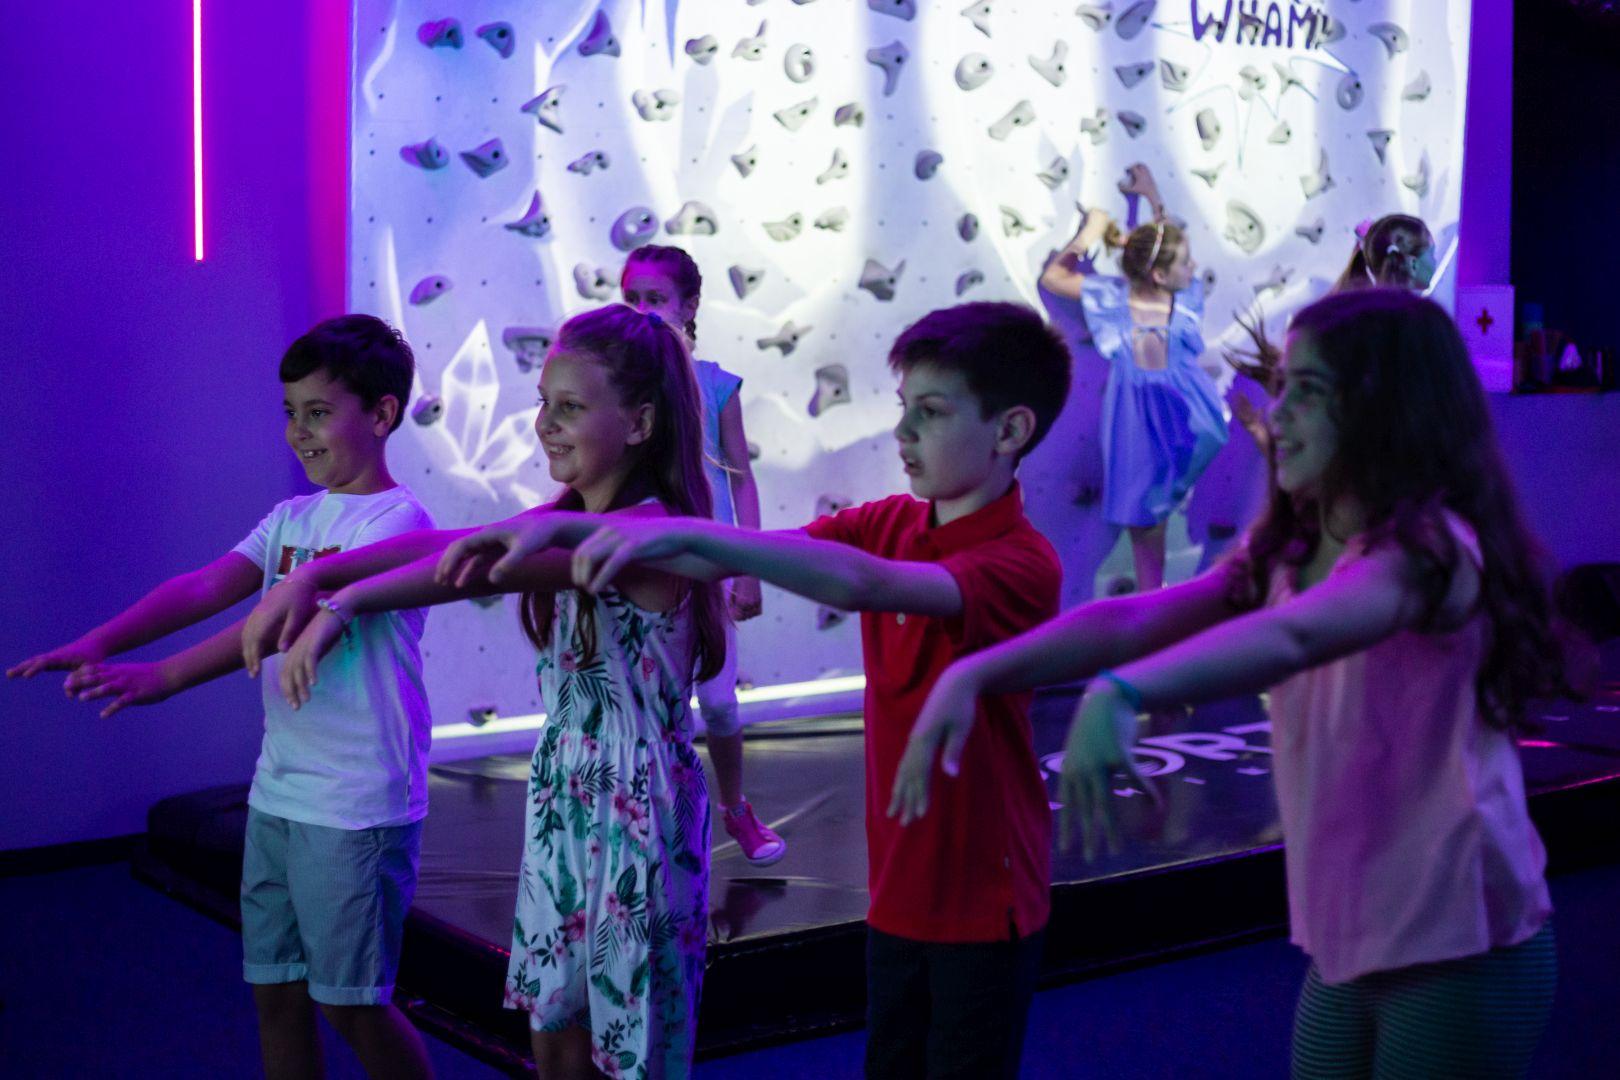 Rodjendan-Proslava-Djuska-ples